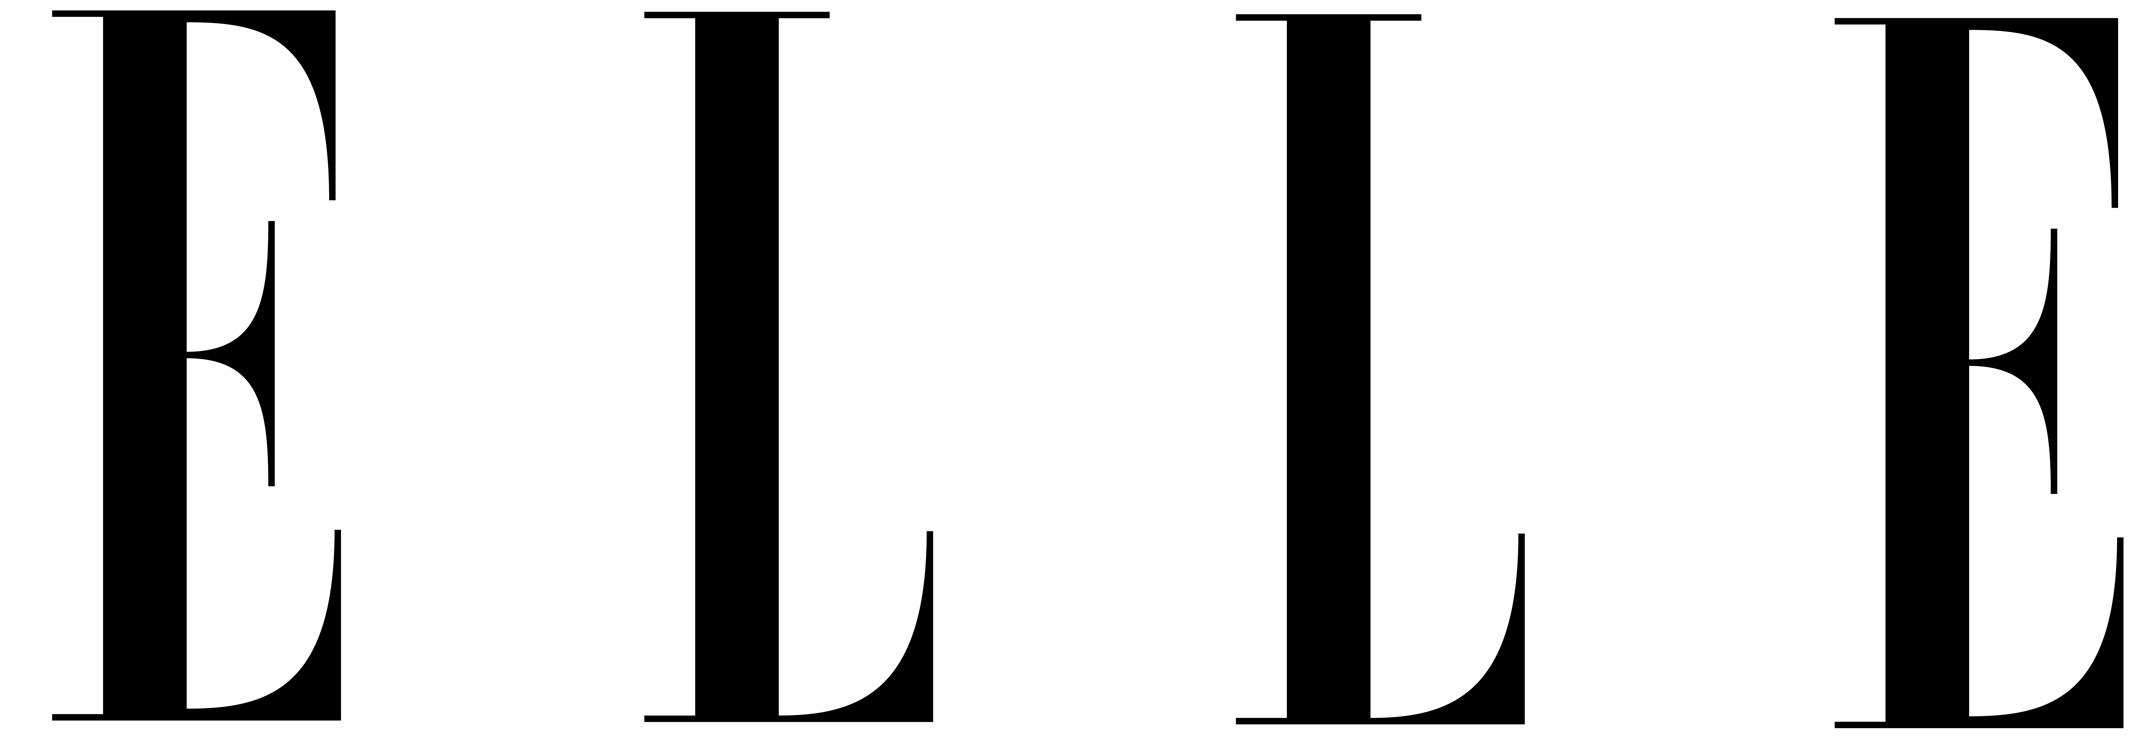 Elle Magazine Online - FEB 2015